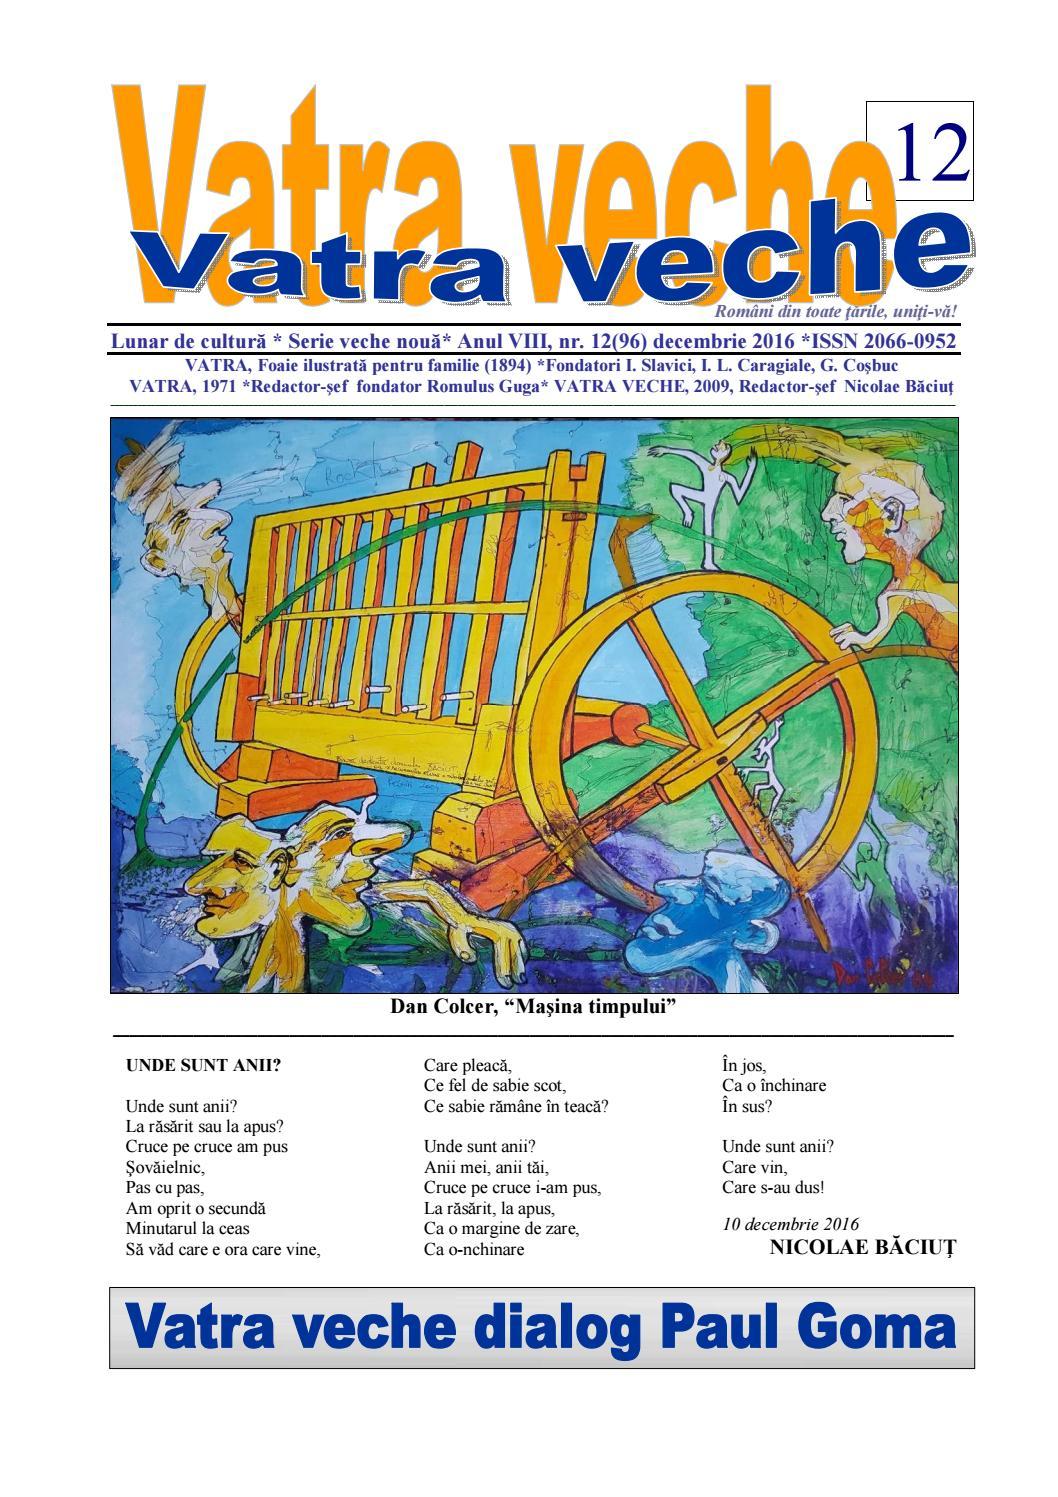 Vatra veche Nr  12 /2016 by Darié Ducan - issuu